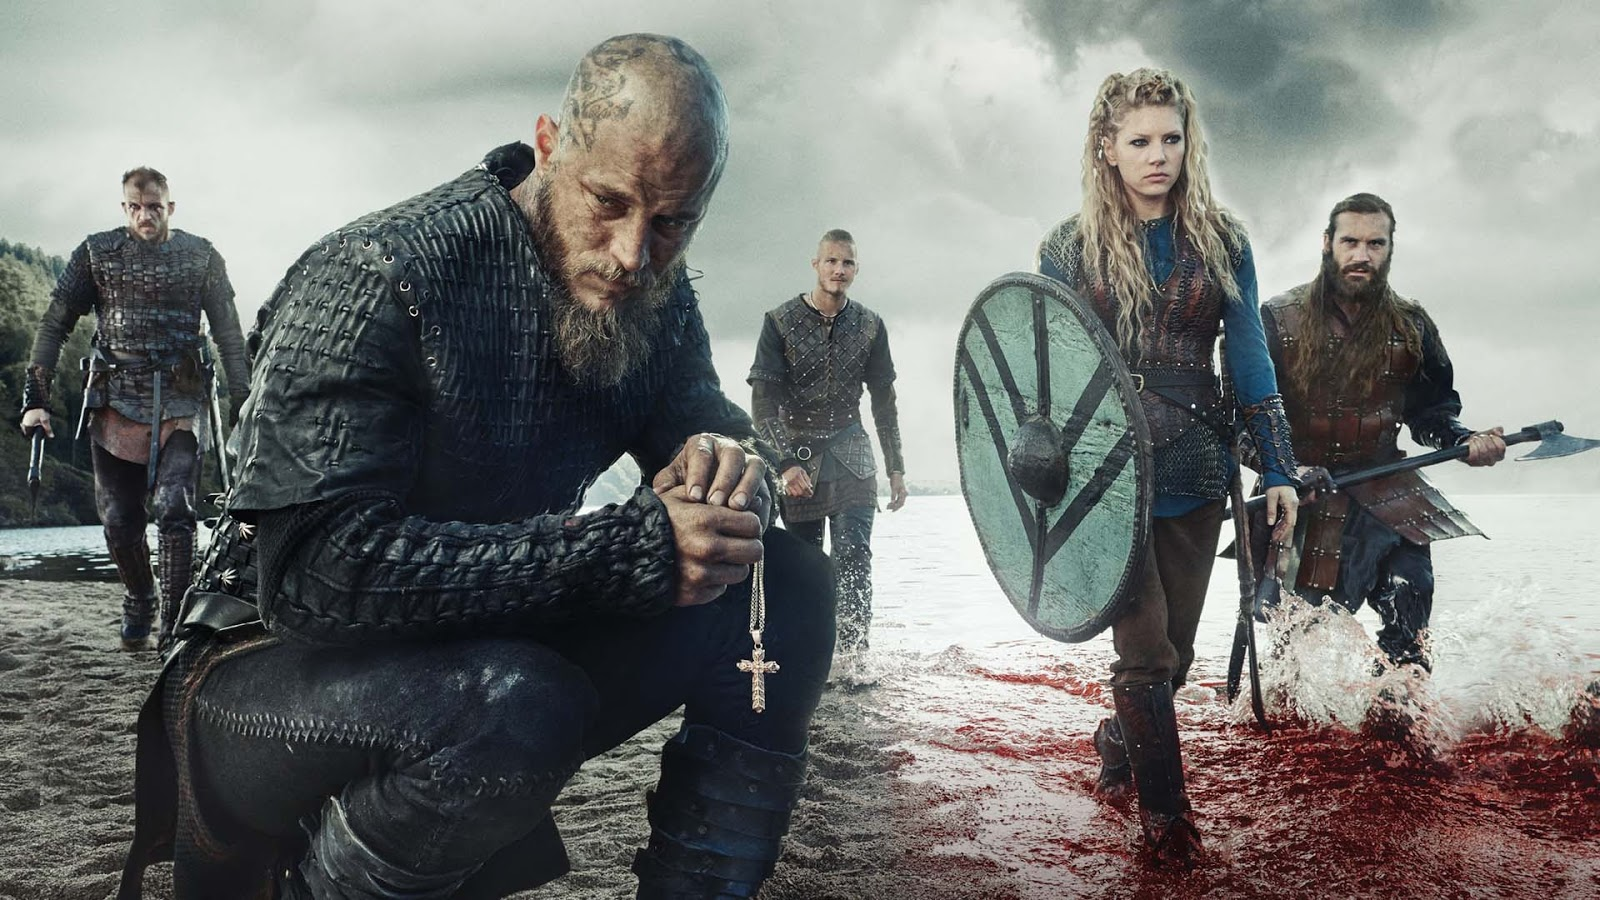 Online Show TV: [Spoilers] Vikings season 5, episode 11